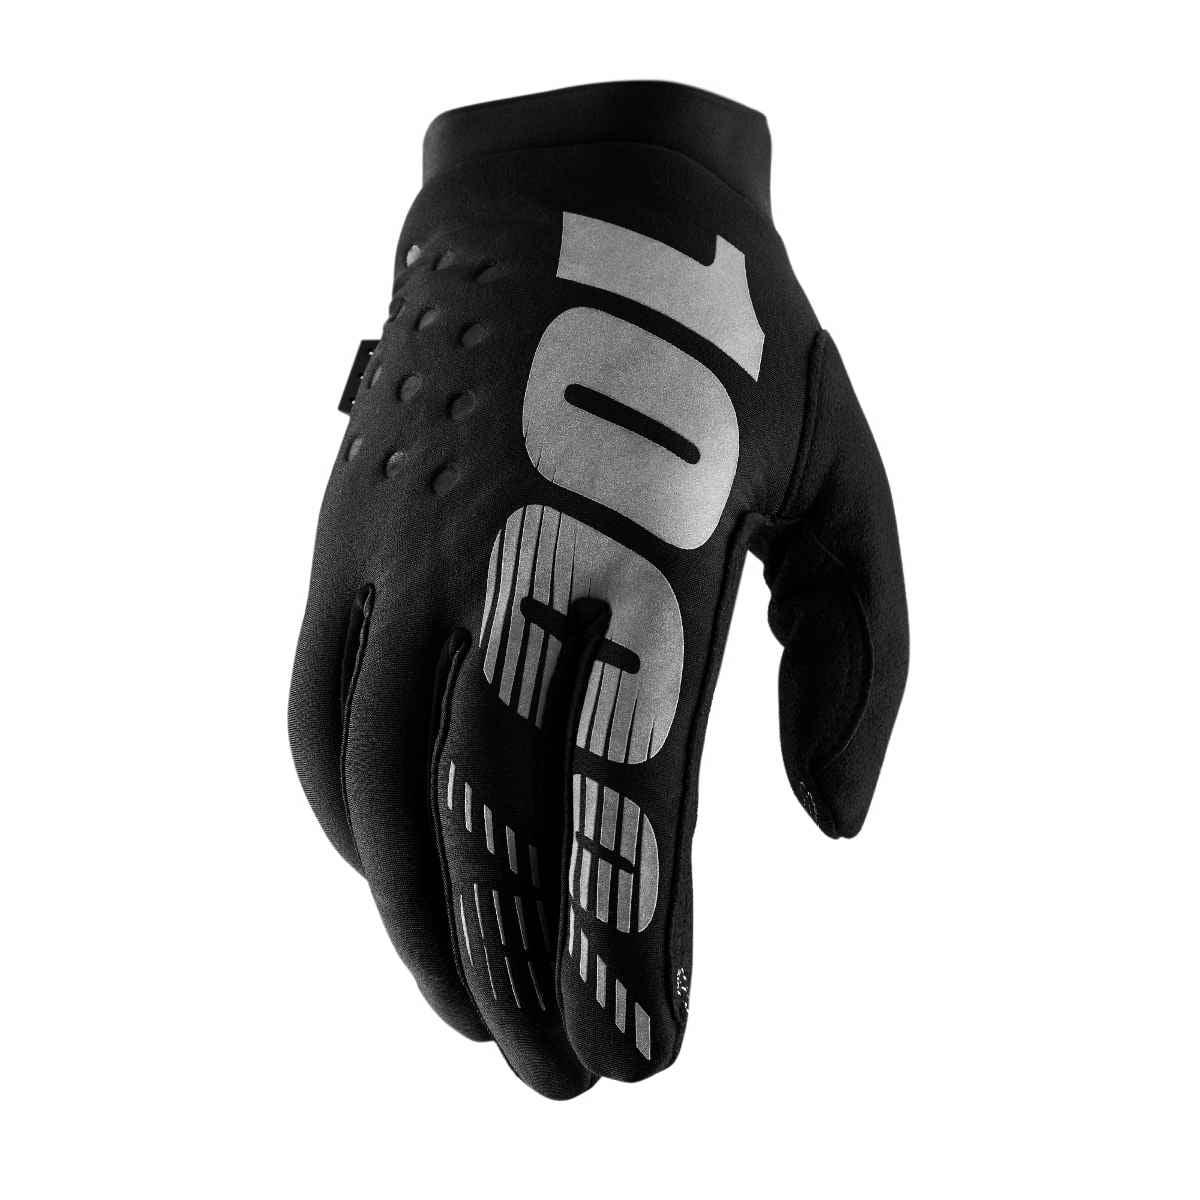 100% Percent BRISKER 100% Women's Glove